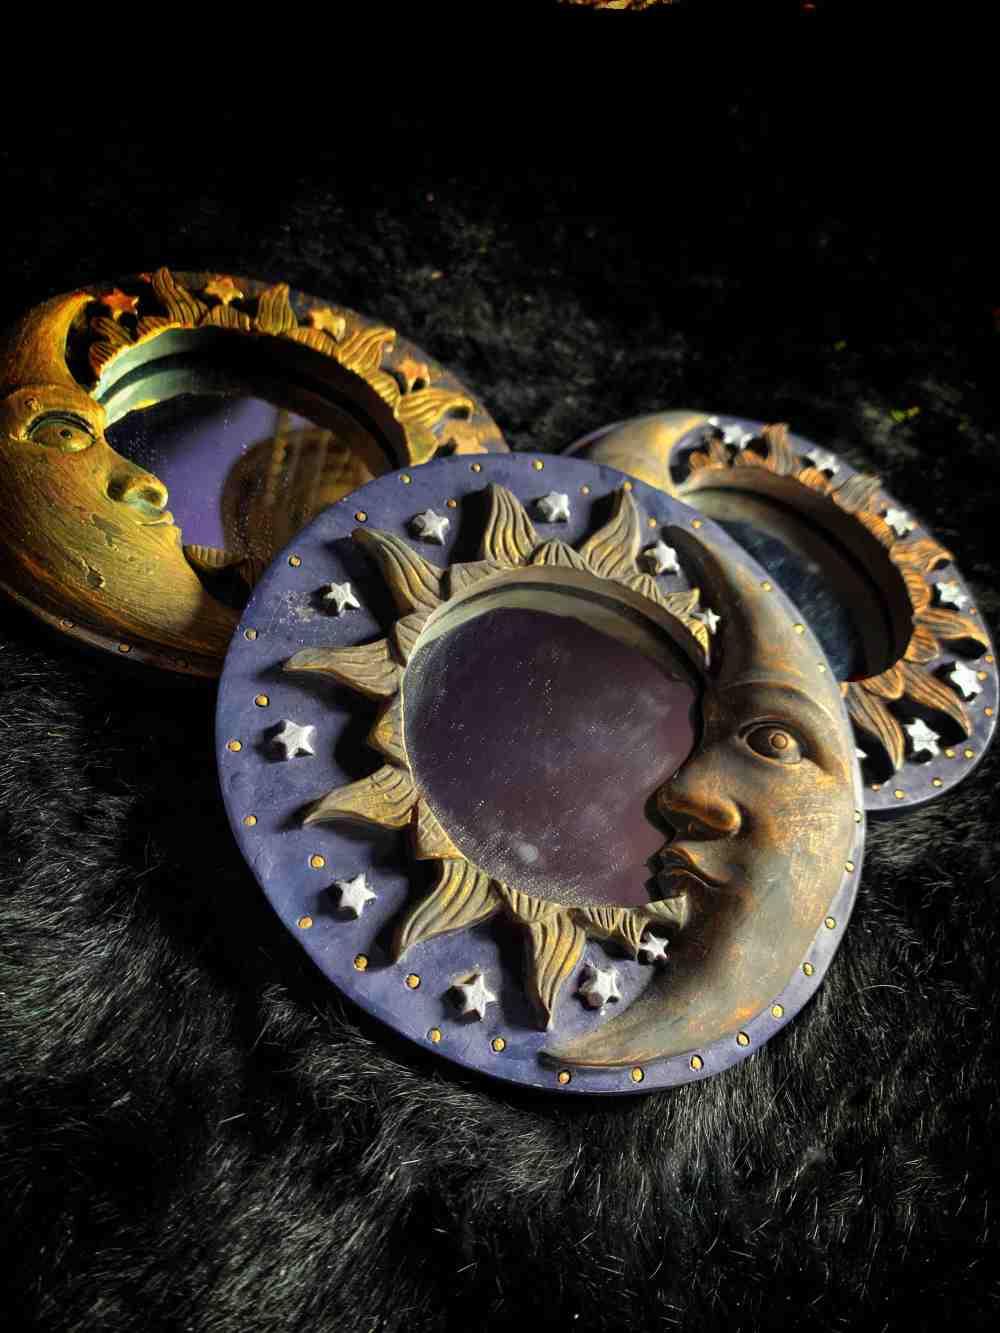 Moon Scrying Mirror Vintage